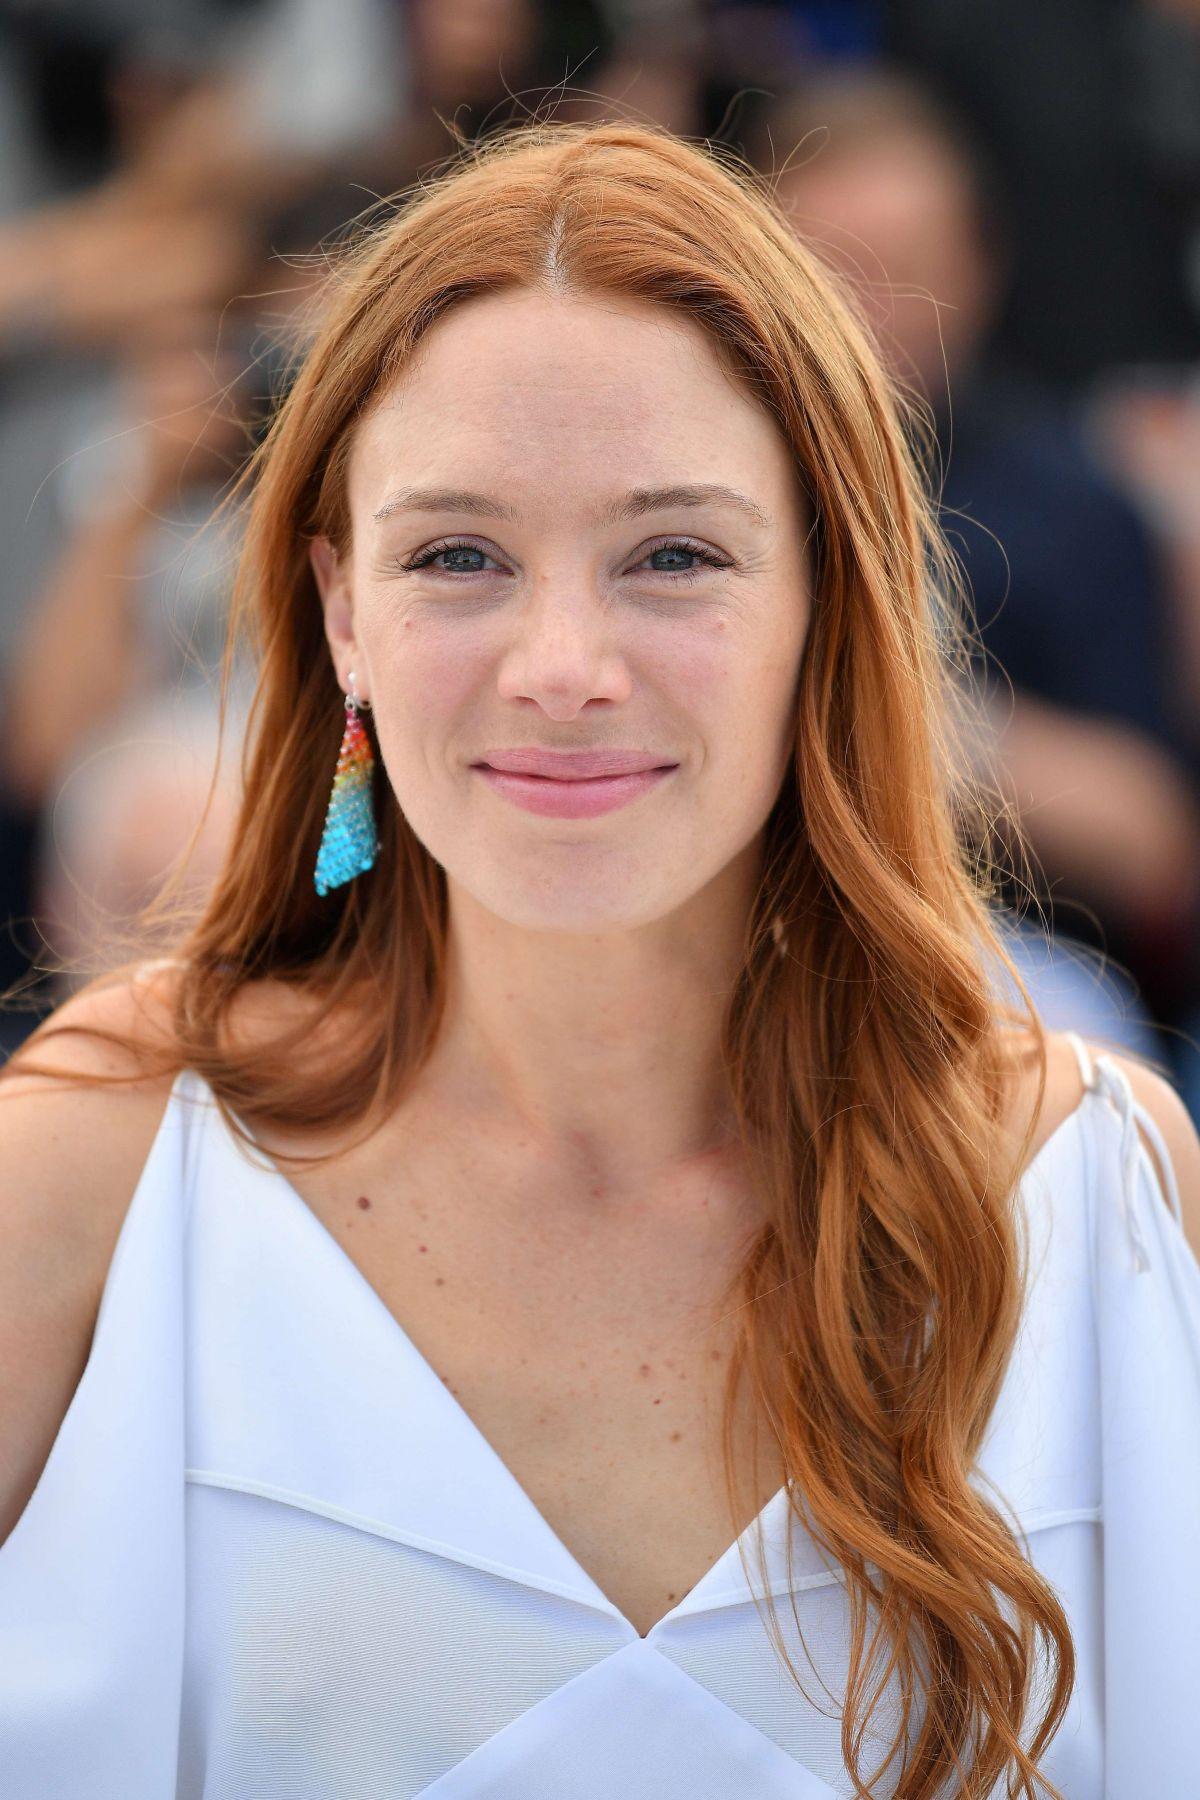 LAETITIA DOSCH at Montparnasse Bienvenue Photocall at 2017 Cannes Film Festival 05/23/2017